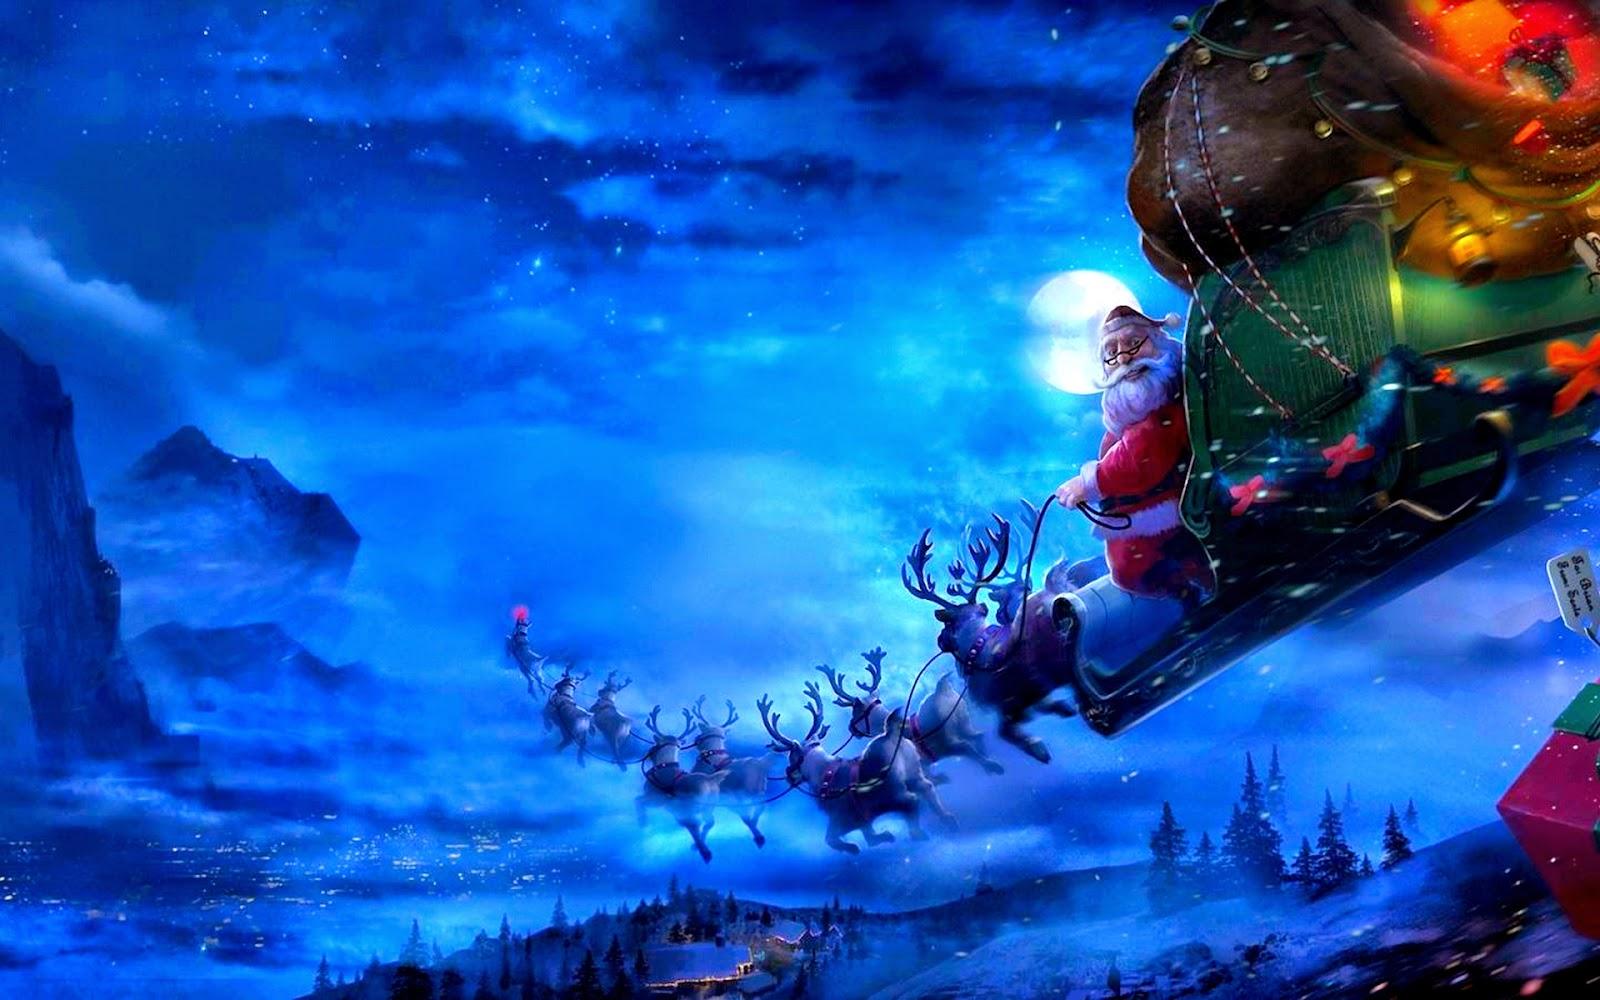 Free Animated Christmas Wallpaper for Desktop (5)